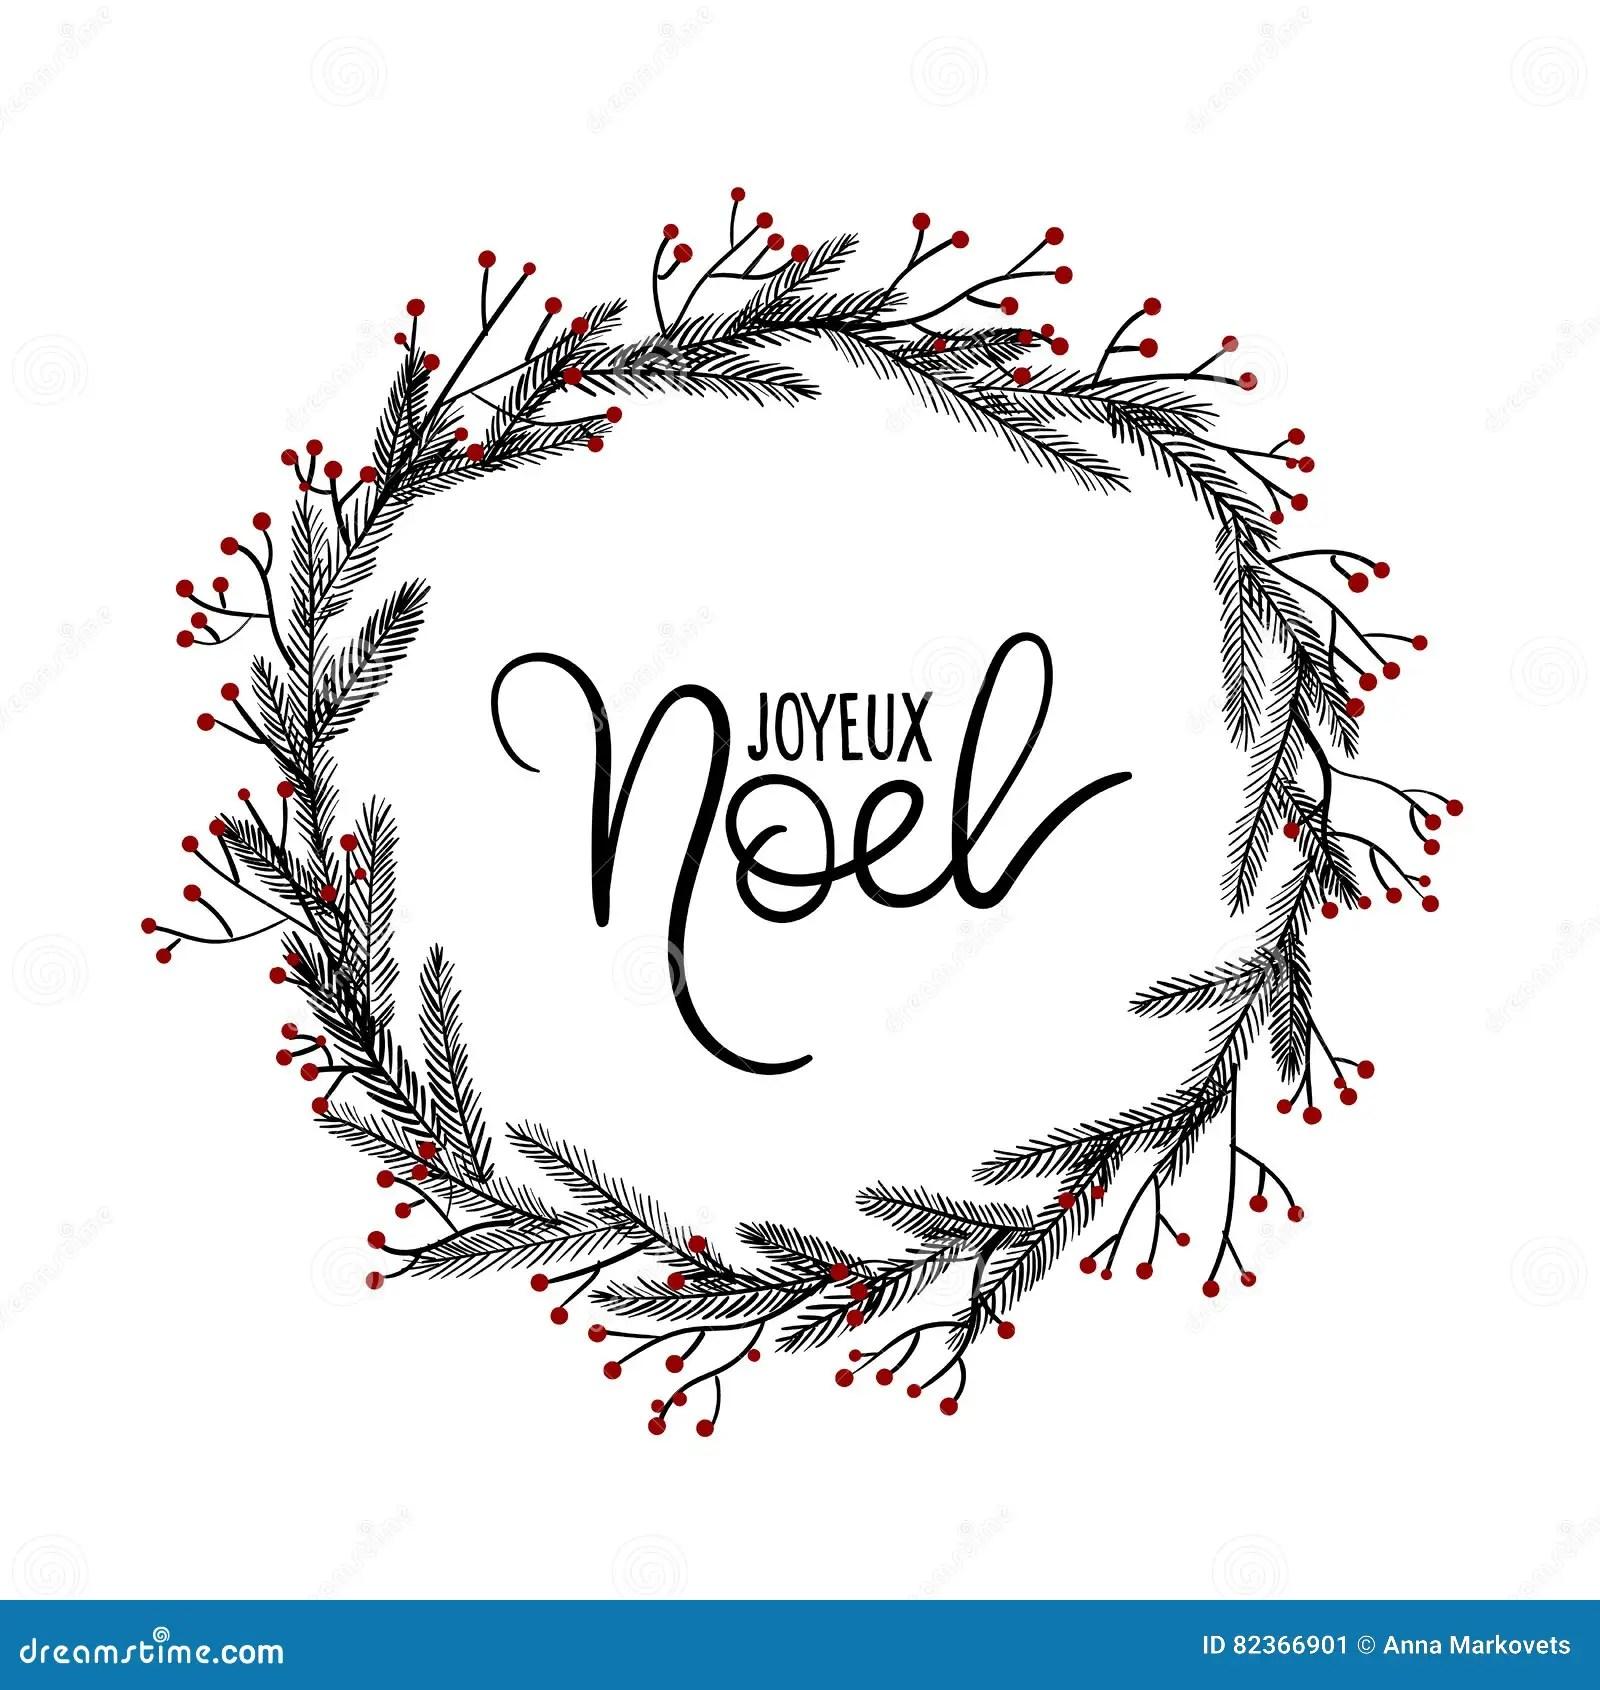 Joyeux Noel Hand Lettering Greeting Card Christmas Wreath